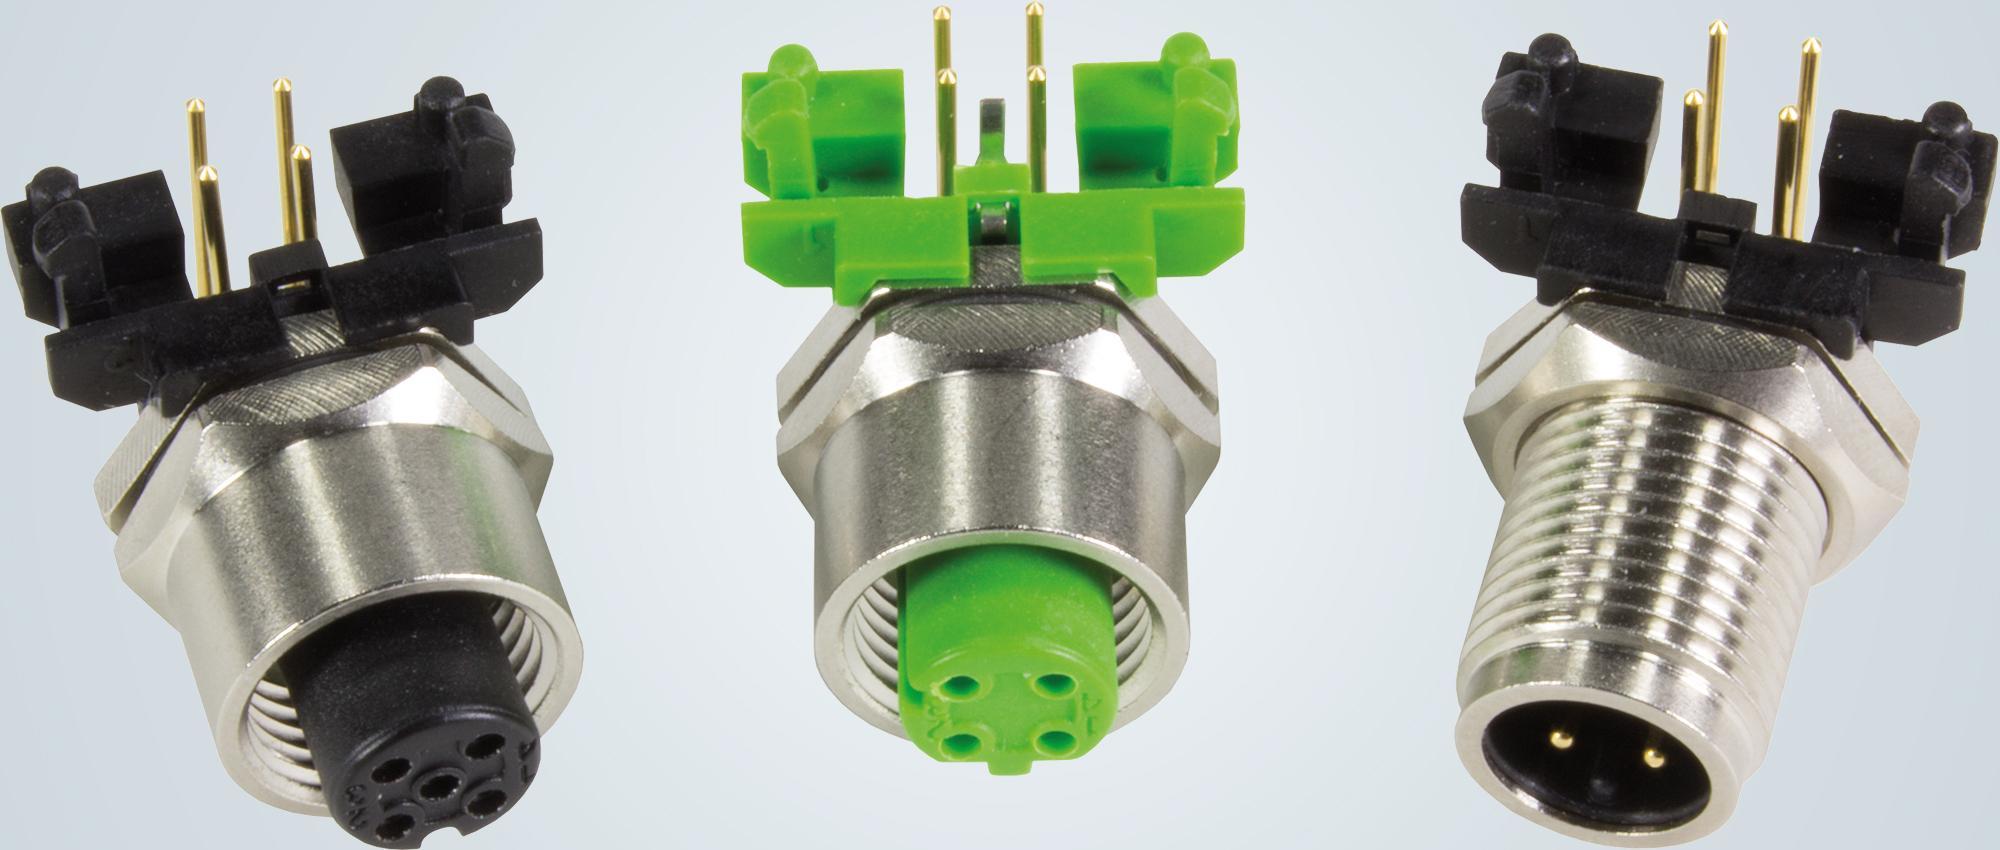 Https Pressemitteilung Harting Stiftung Co Kg Champion Ultrastar Wiring Diagram Pr 538 M12 Circular Connector